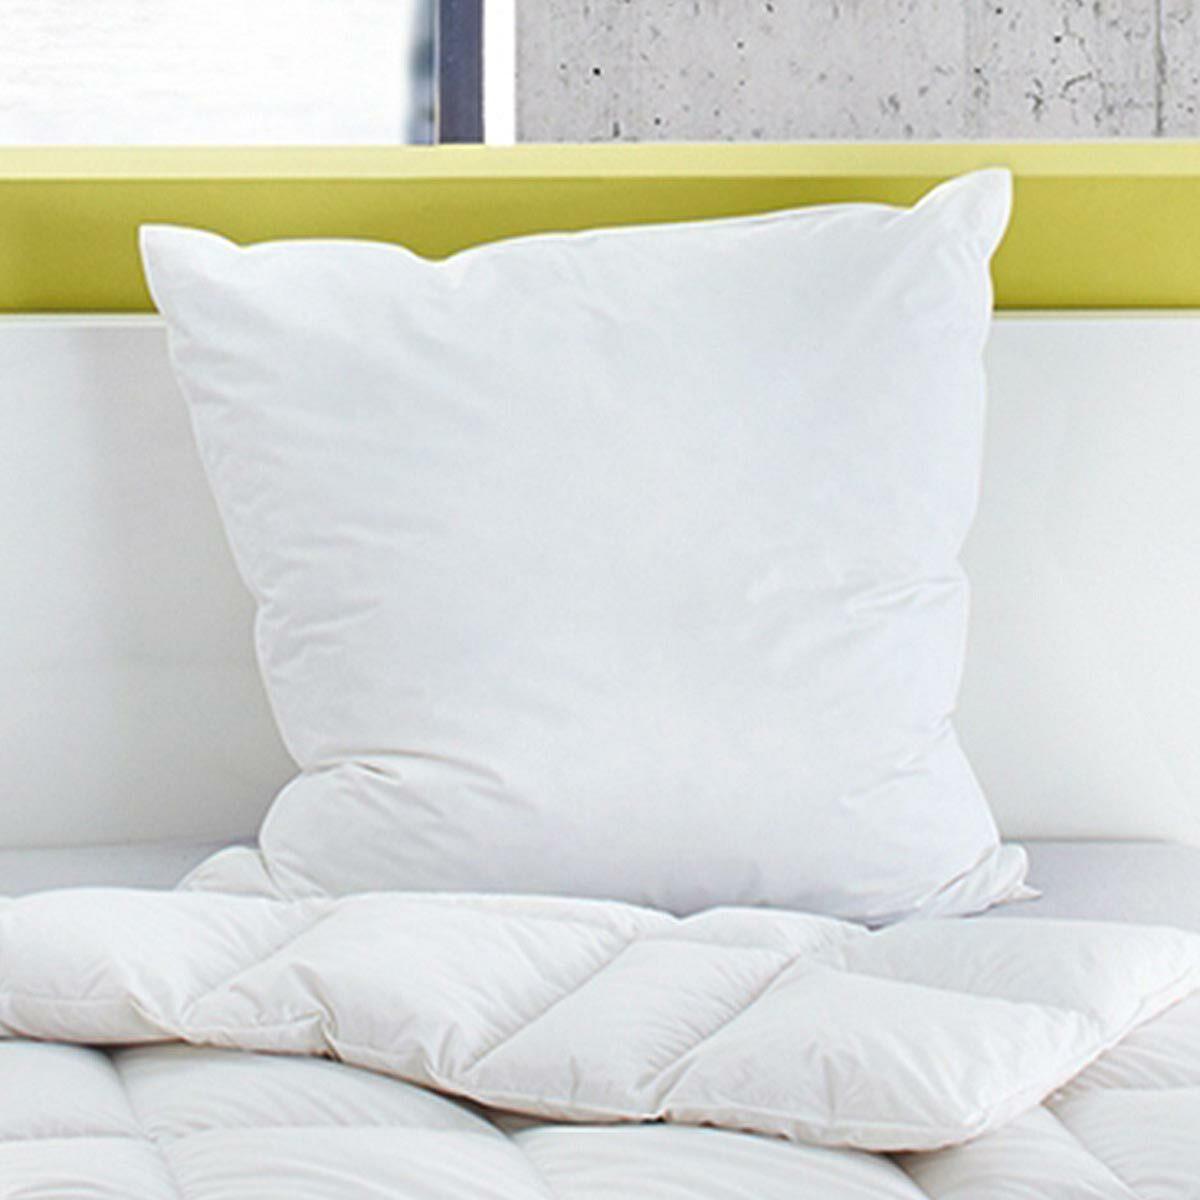 Häussling 3-Kammer-Kissen Select multi sleep soft